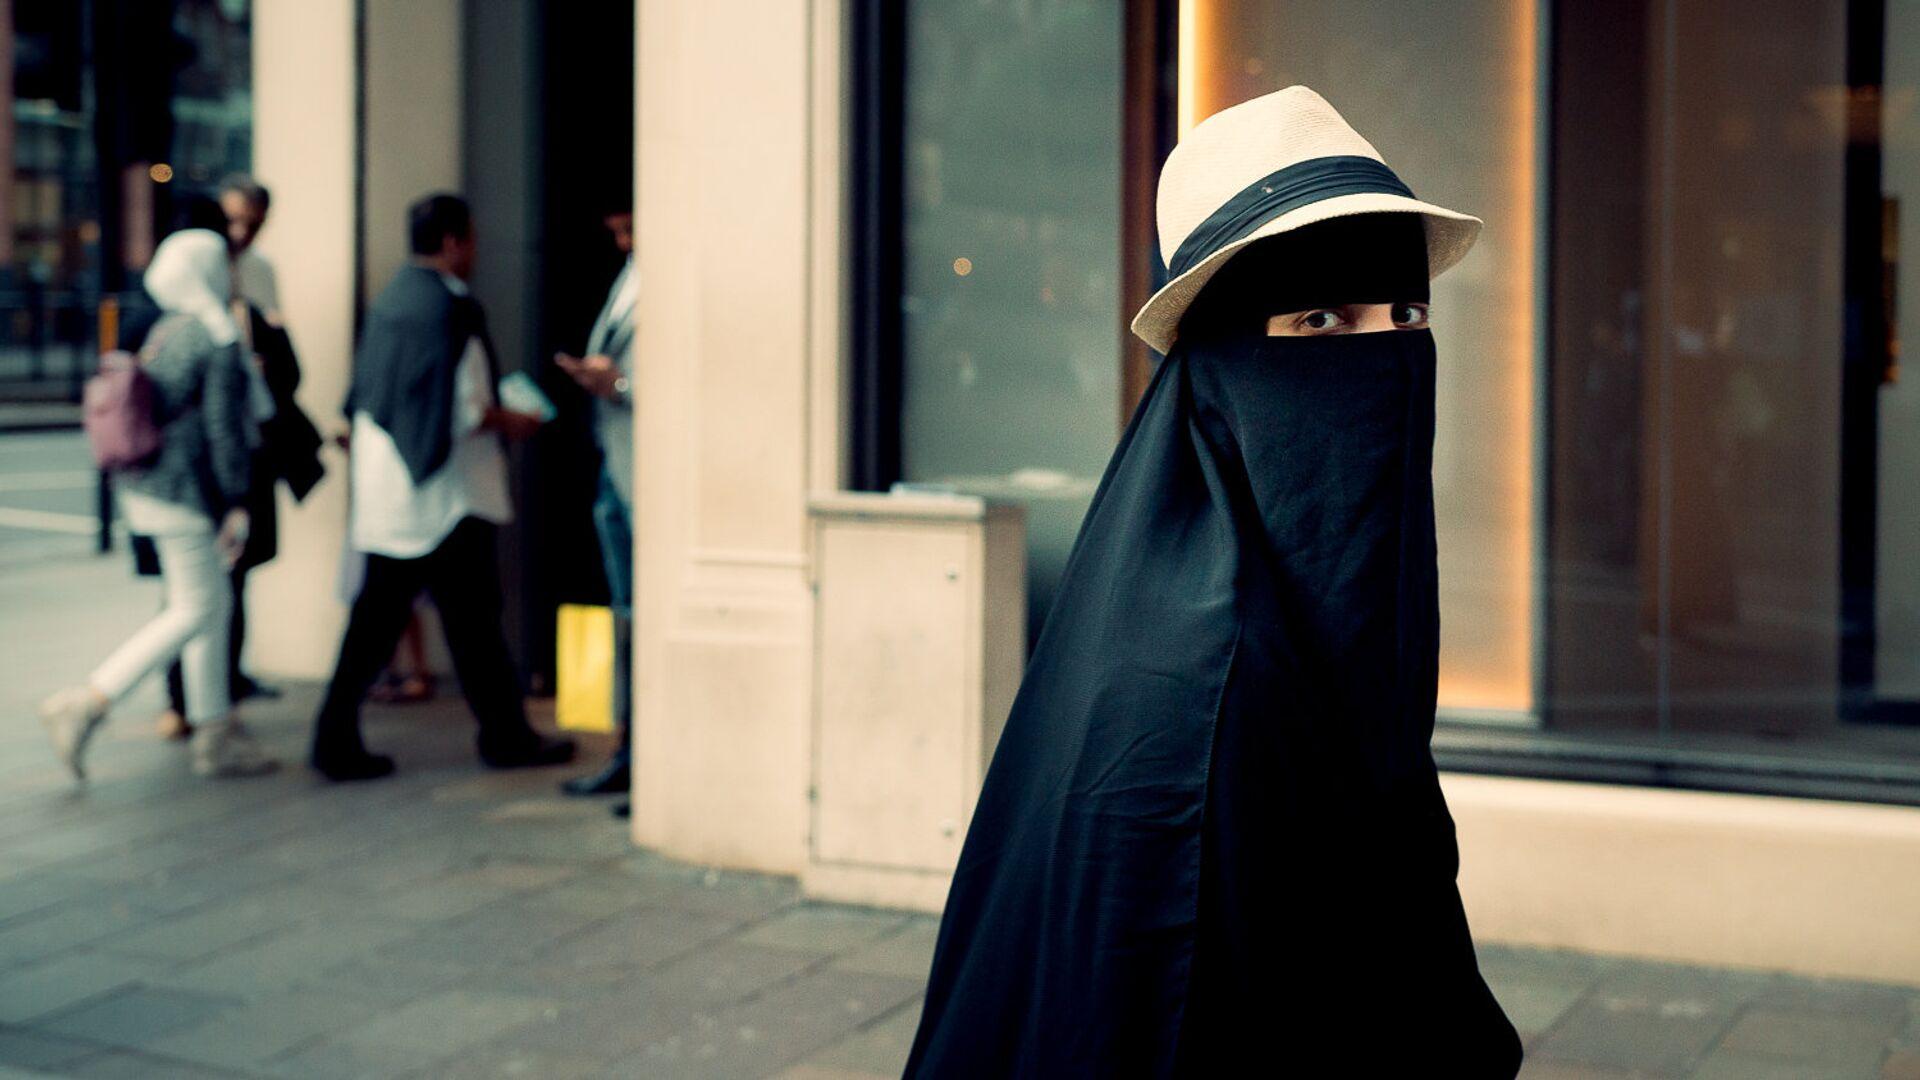 Una mujer en niqab - Sputnik Mundo, 1920, 07.03.2021